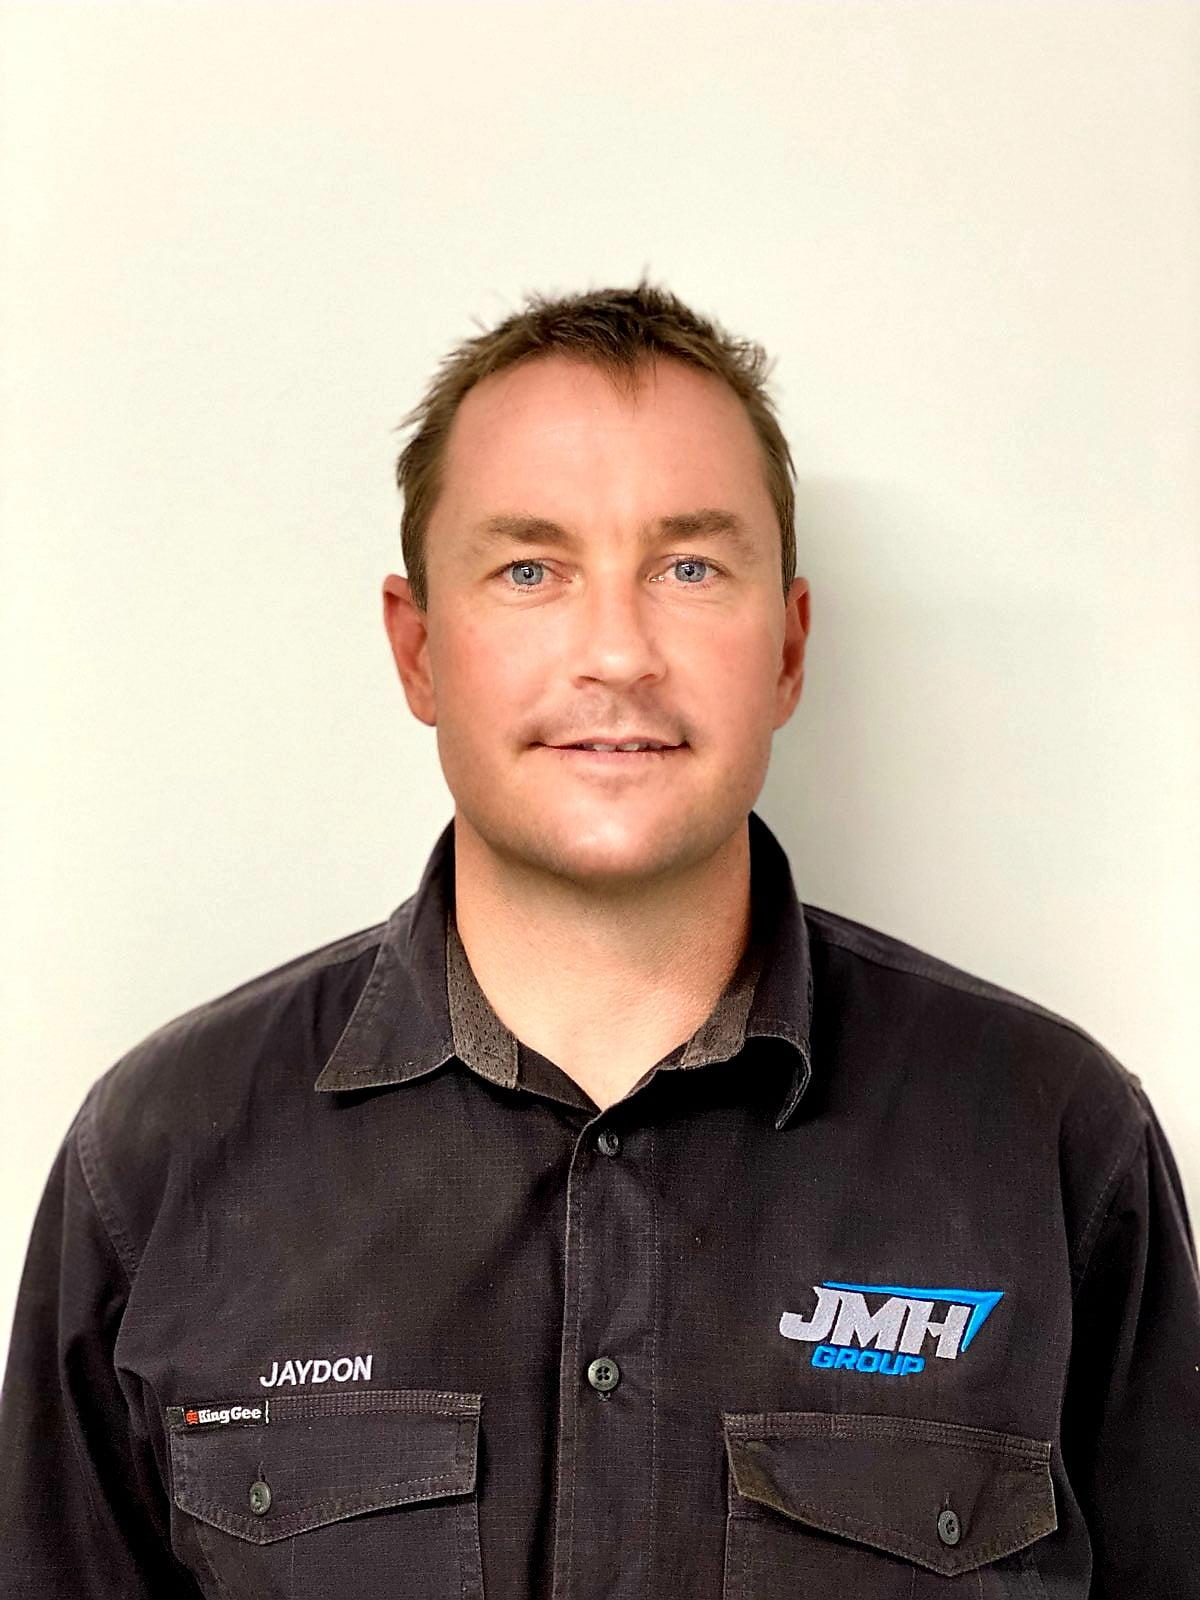 Jaydon Hirst